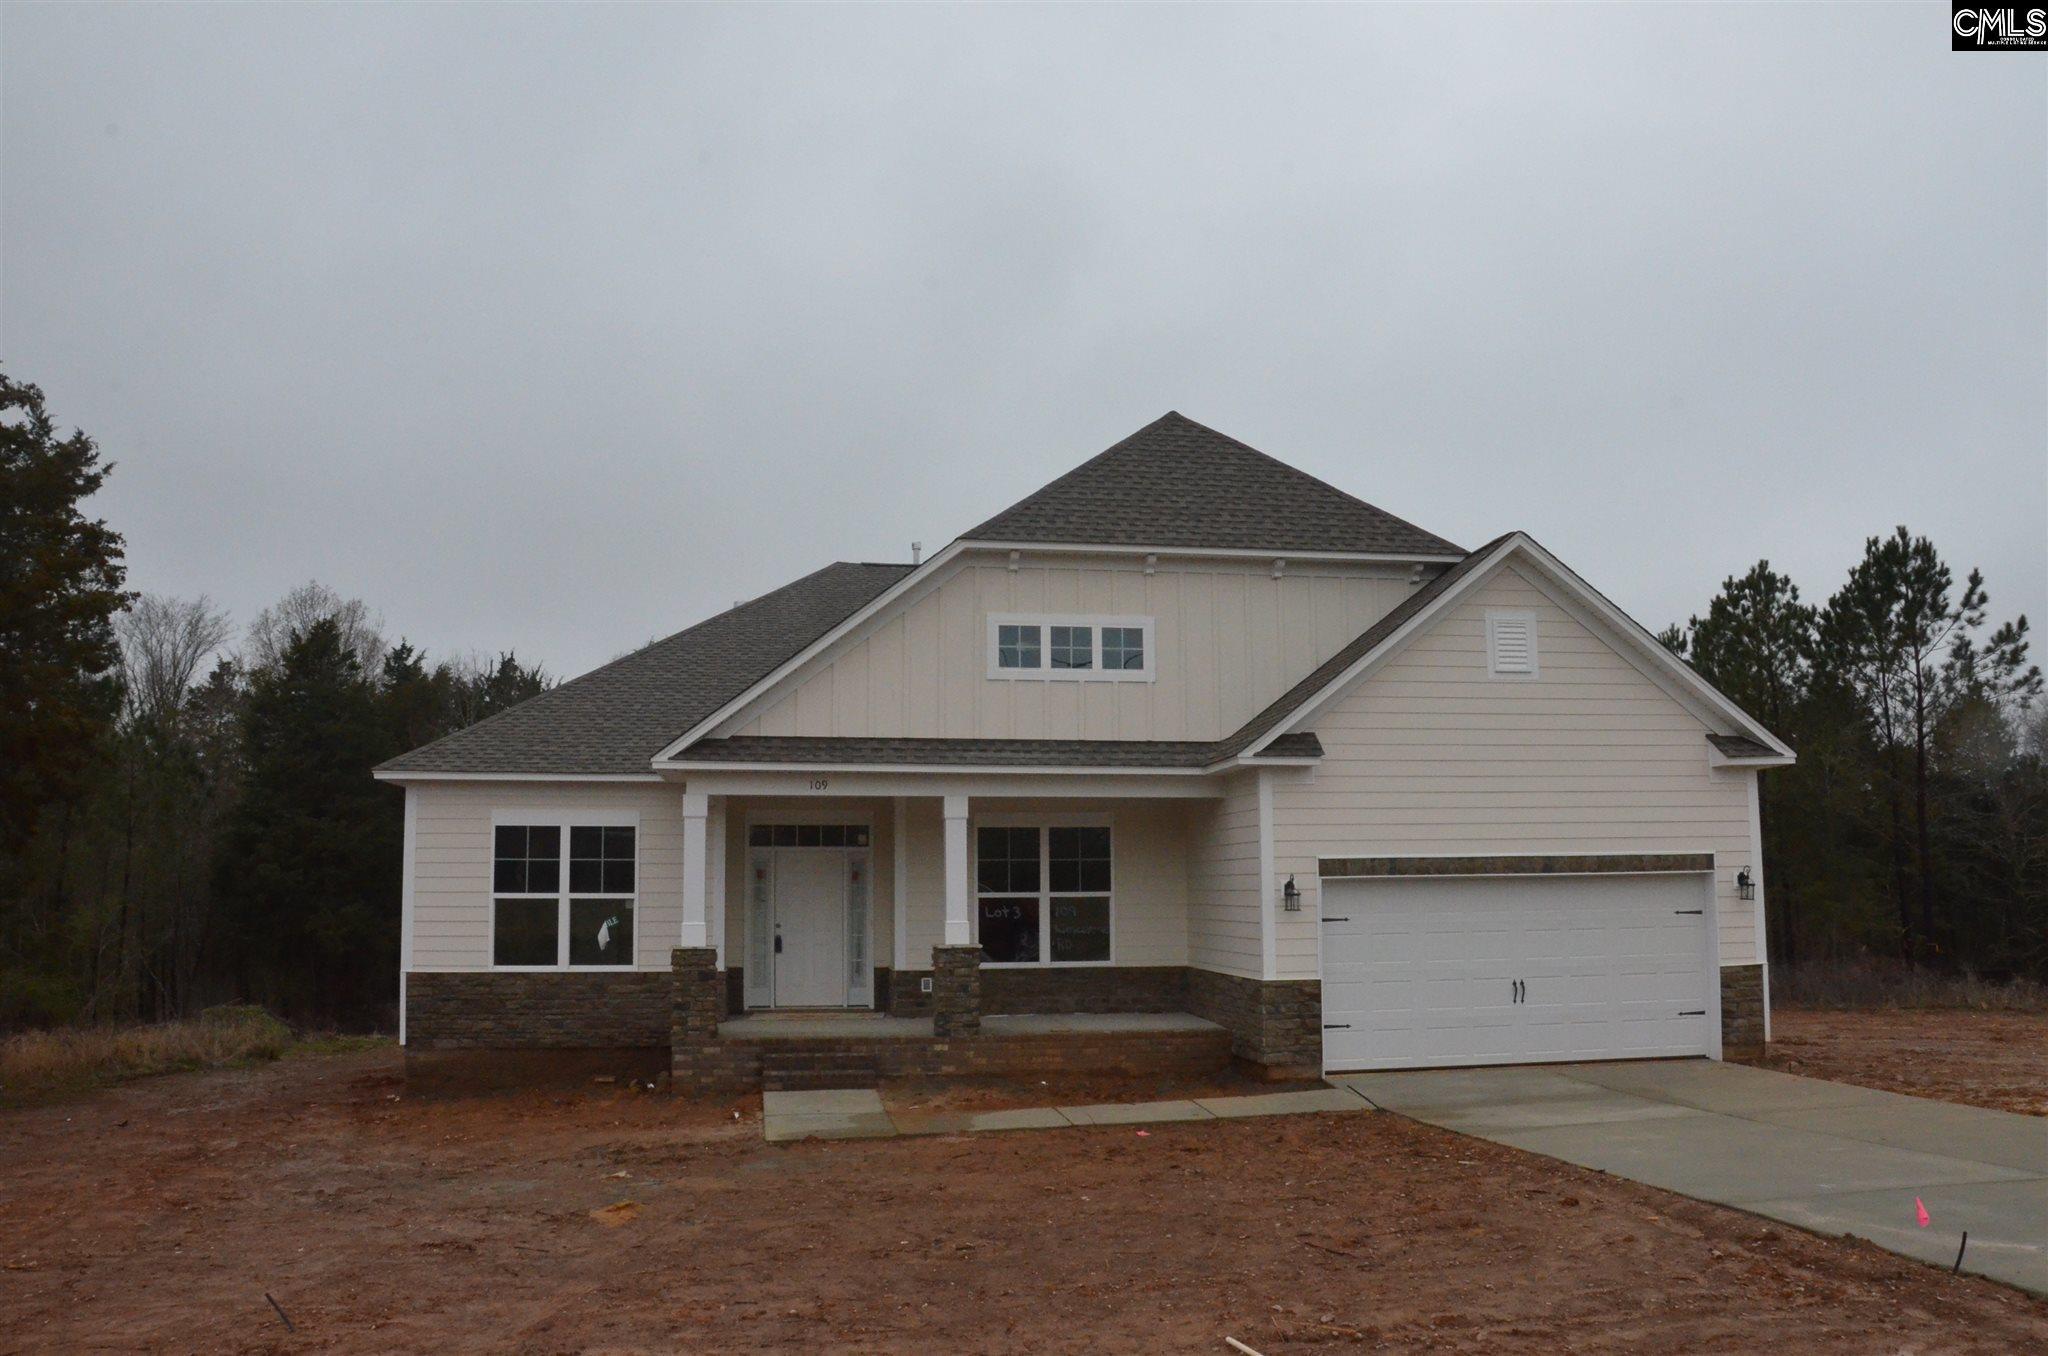 109 Limestone Rd. Chapin, SC 29036